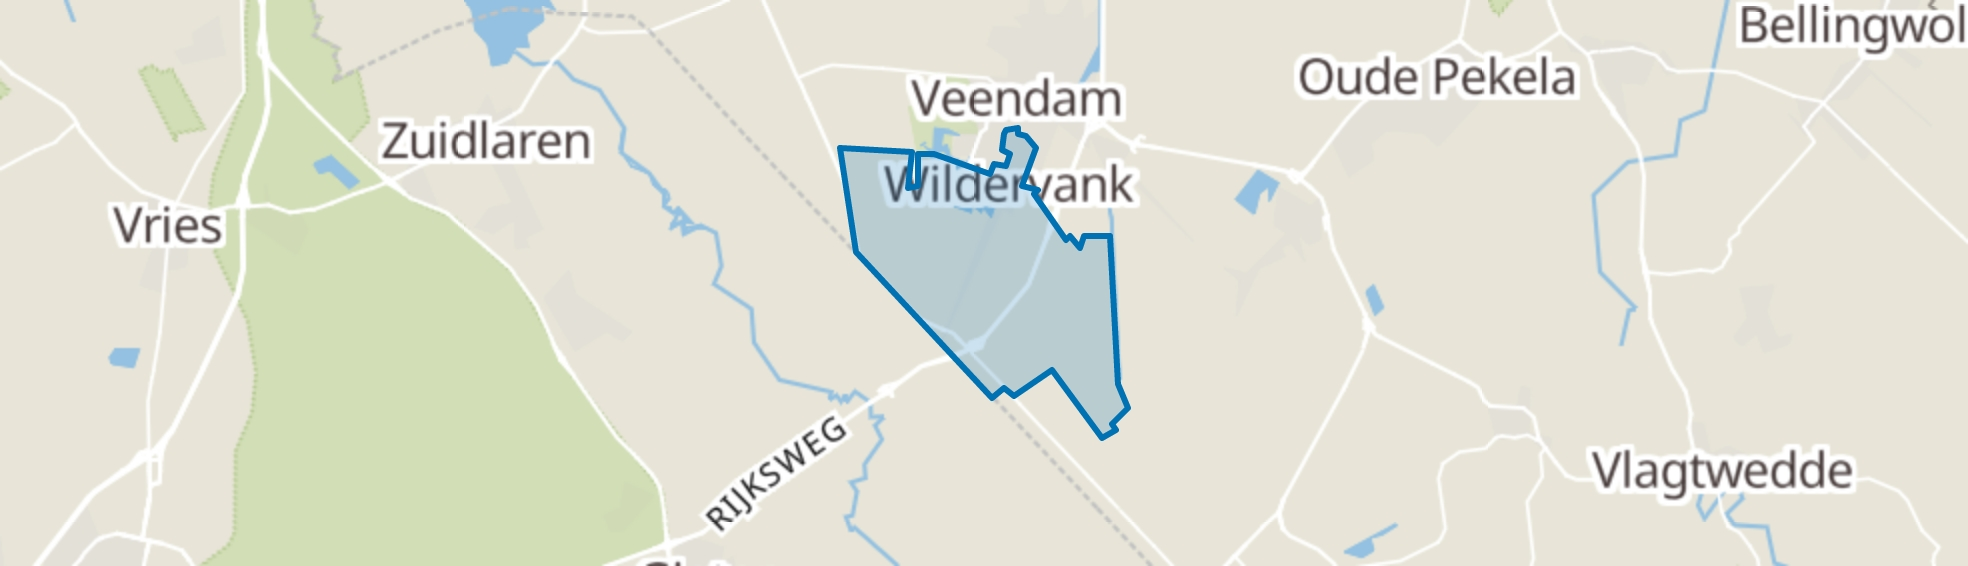 Wildervank map